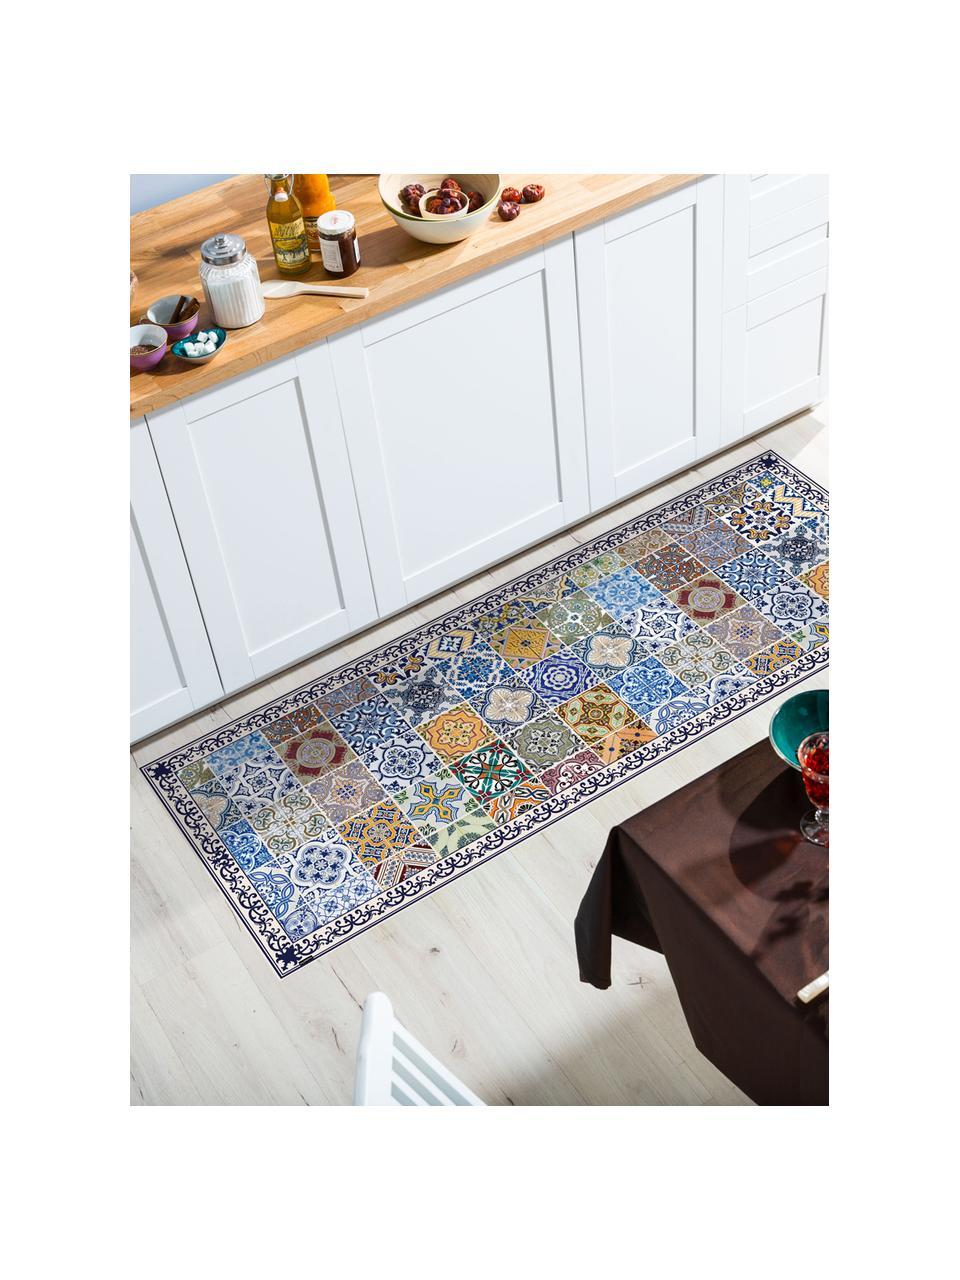 Vlakke vinyl vloermat Pablo met kleurrijke print, antislip, Recyclebaar vinyl, Multicolour, 65 x 255 cm